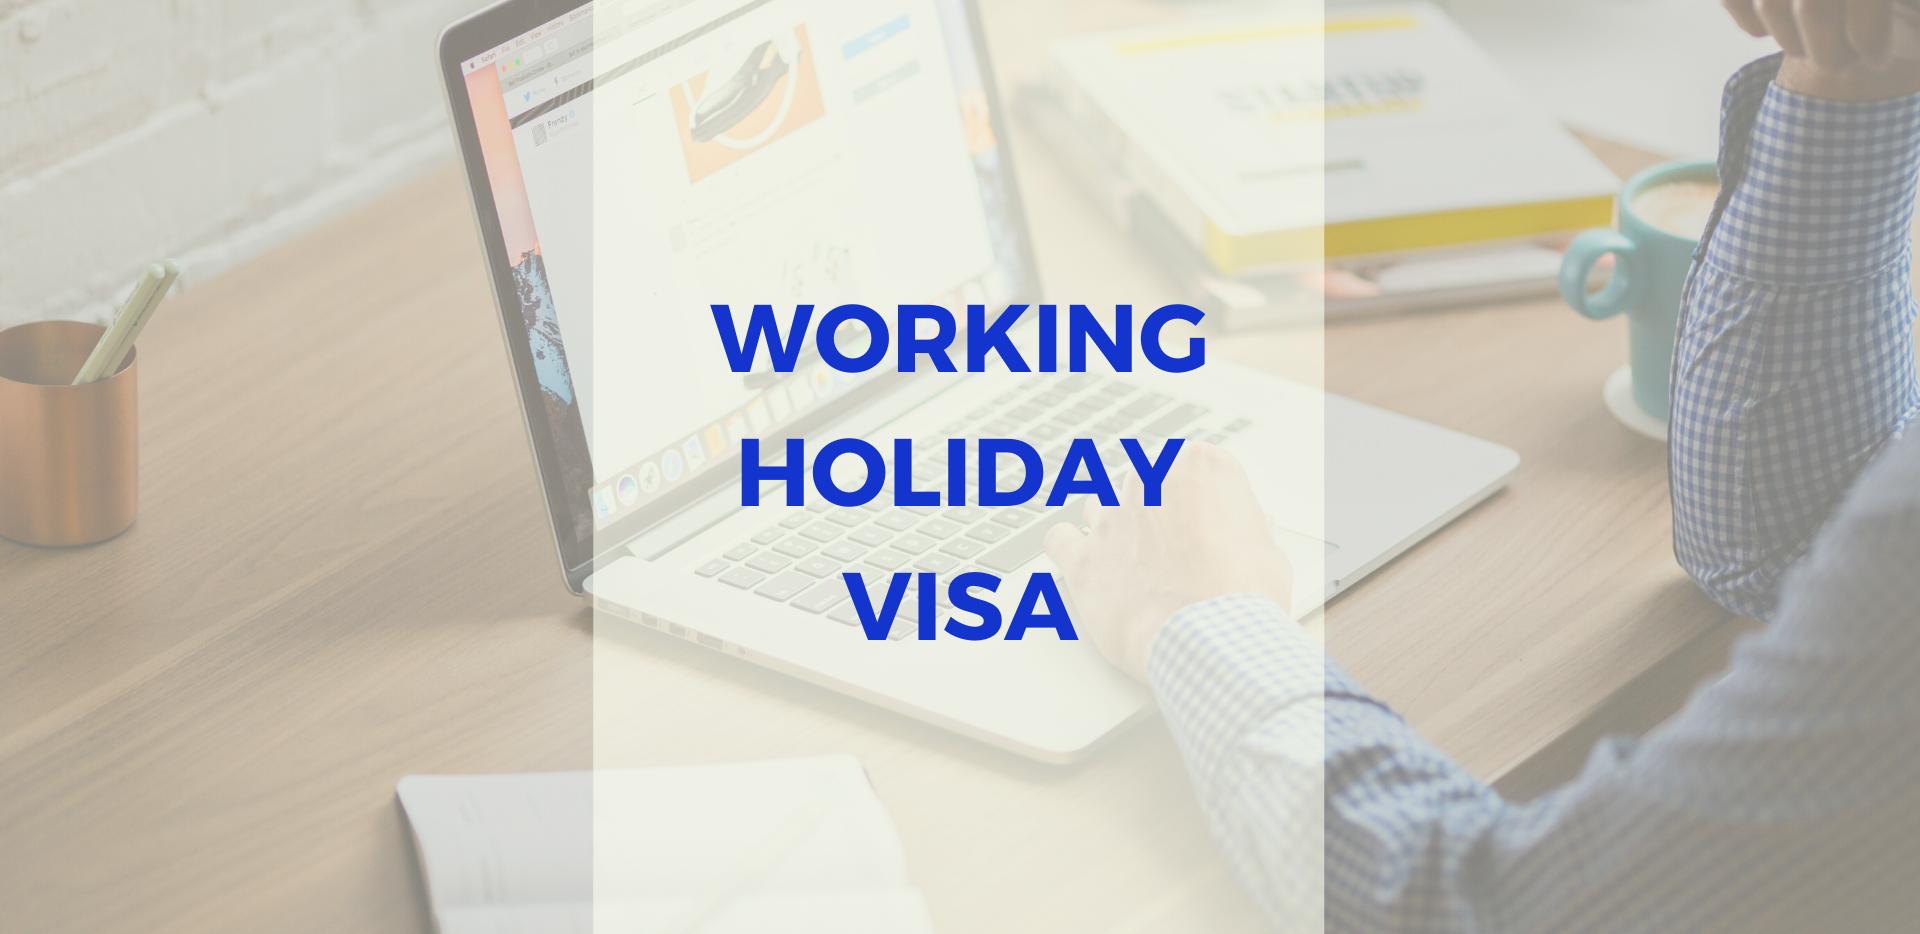 Working holiday visa per la Corea del Sud